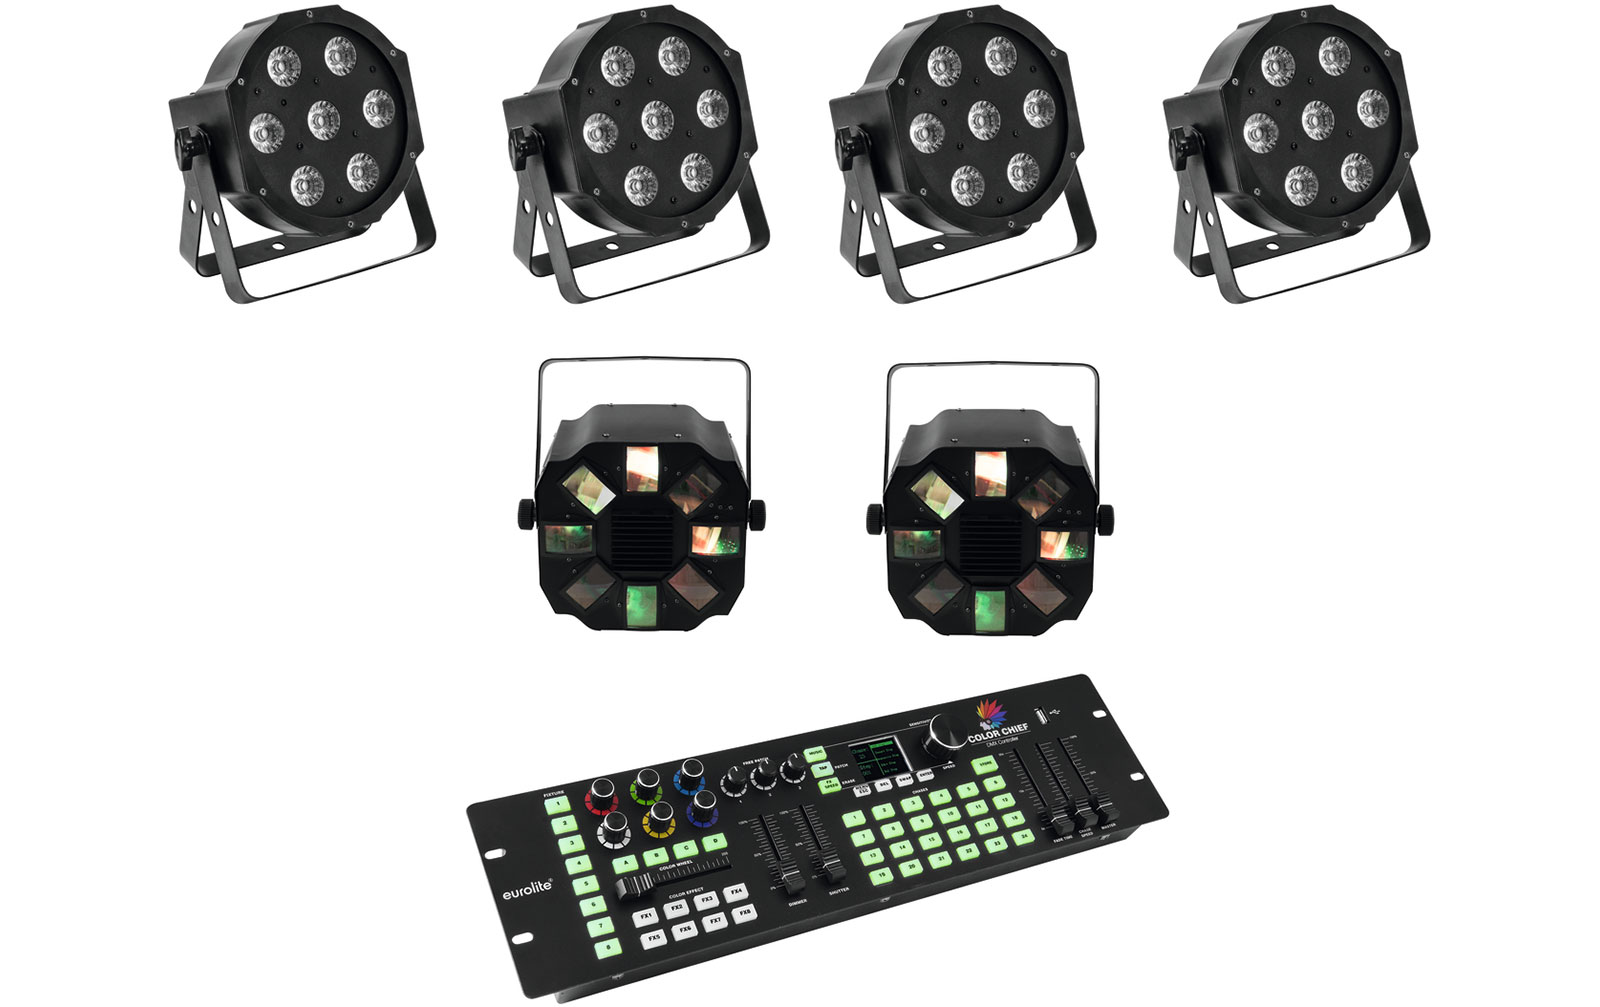 eurolite-set-4x-led-sls-7-hcl-floor-2x-led-fe-700-dmx-led-co